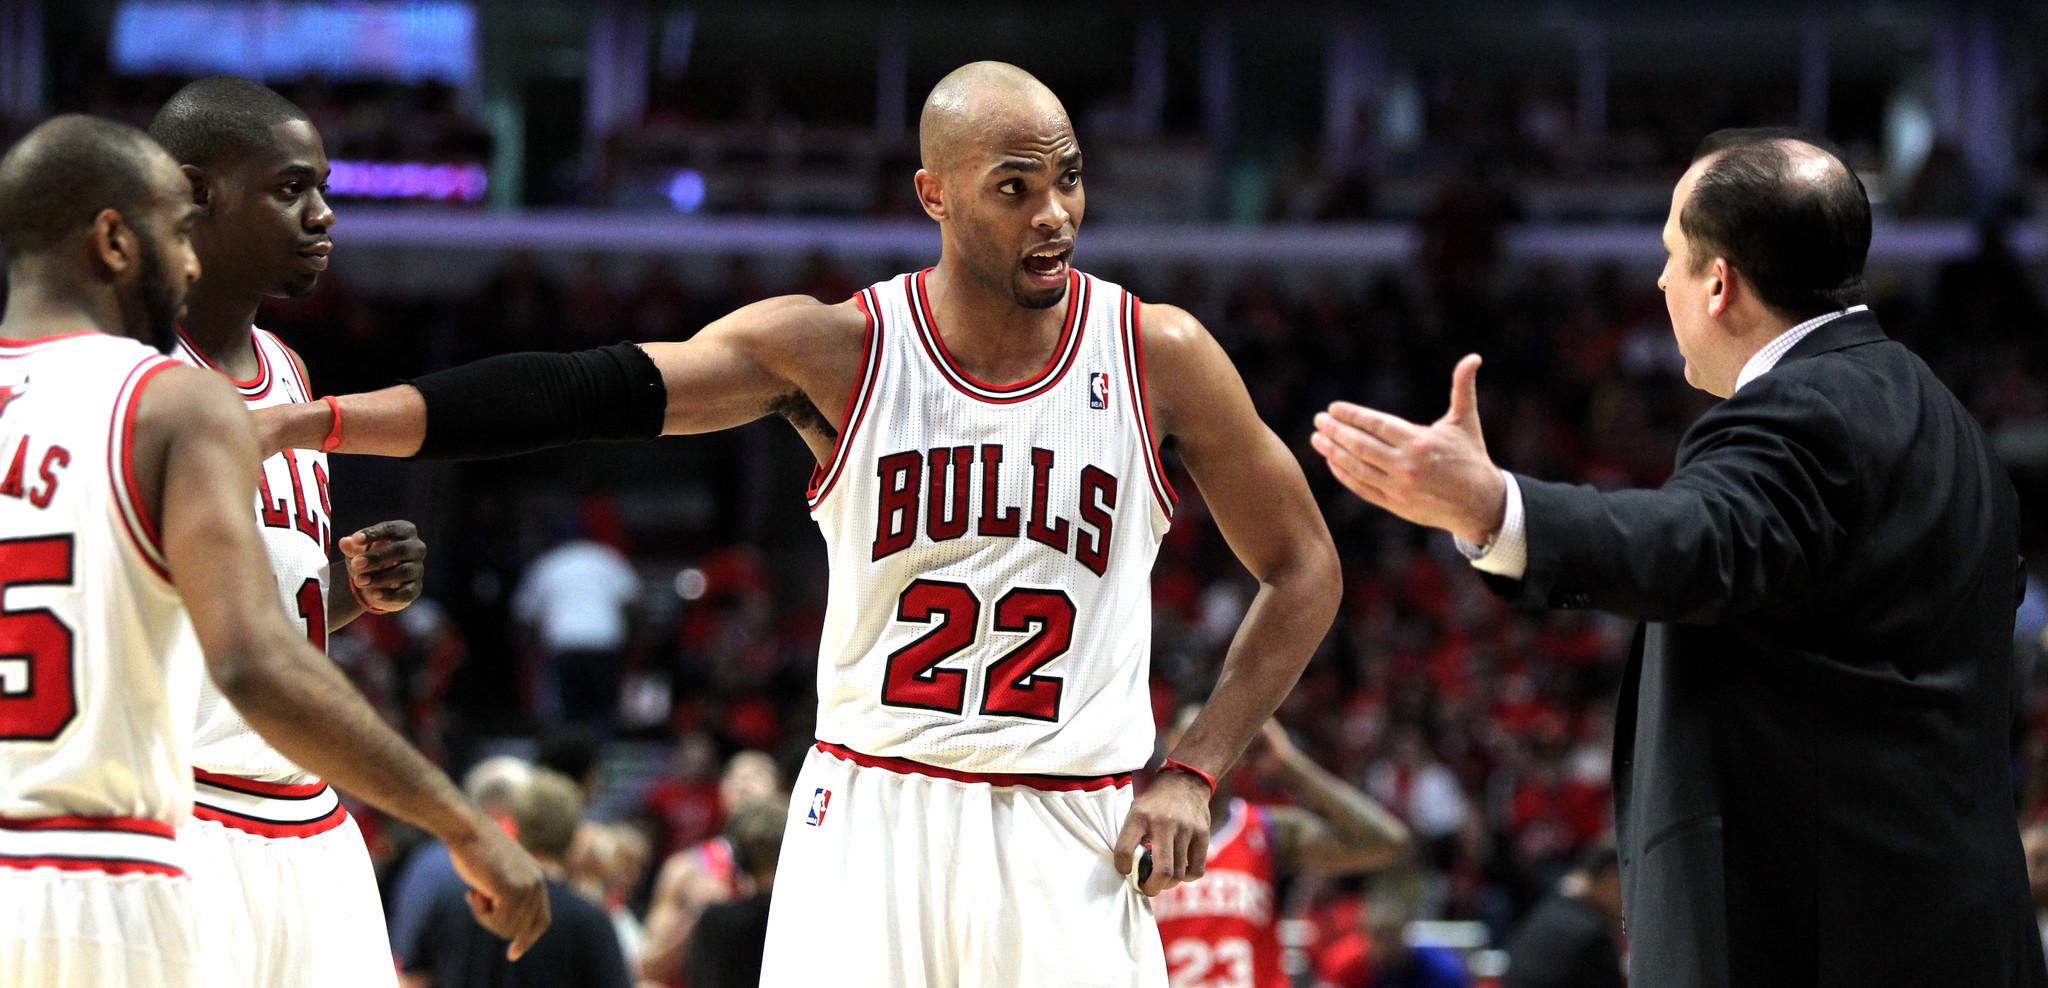 Bulls forward Taj Gibson (22) talks with coach Tom Thibodeau in the second half. (Chris Sweda/Tribune photo)